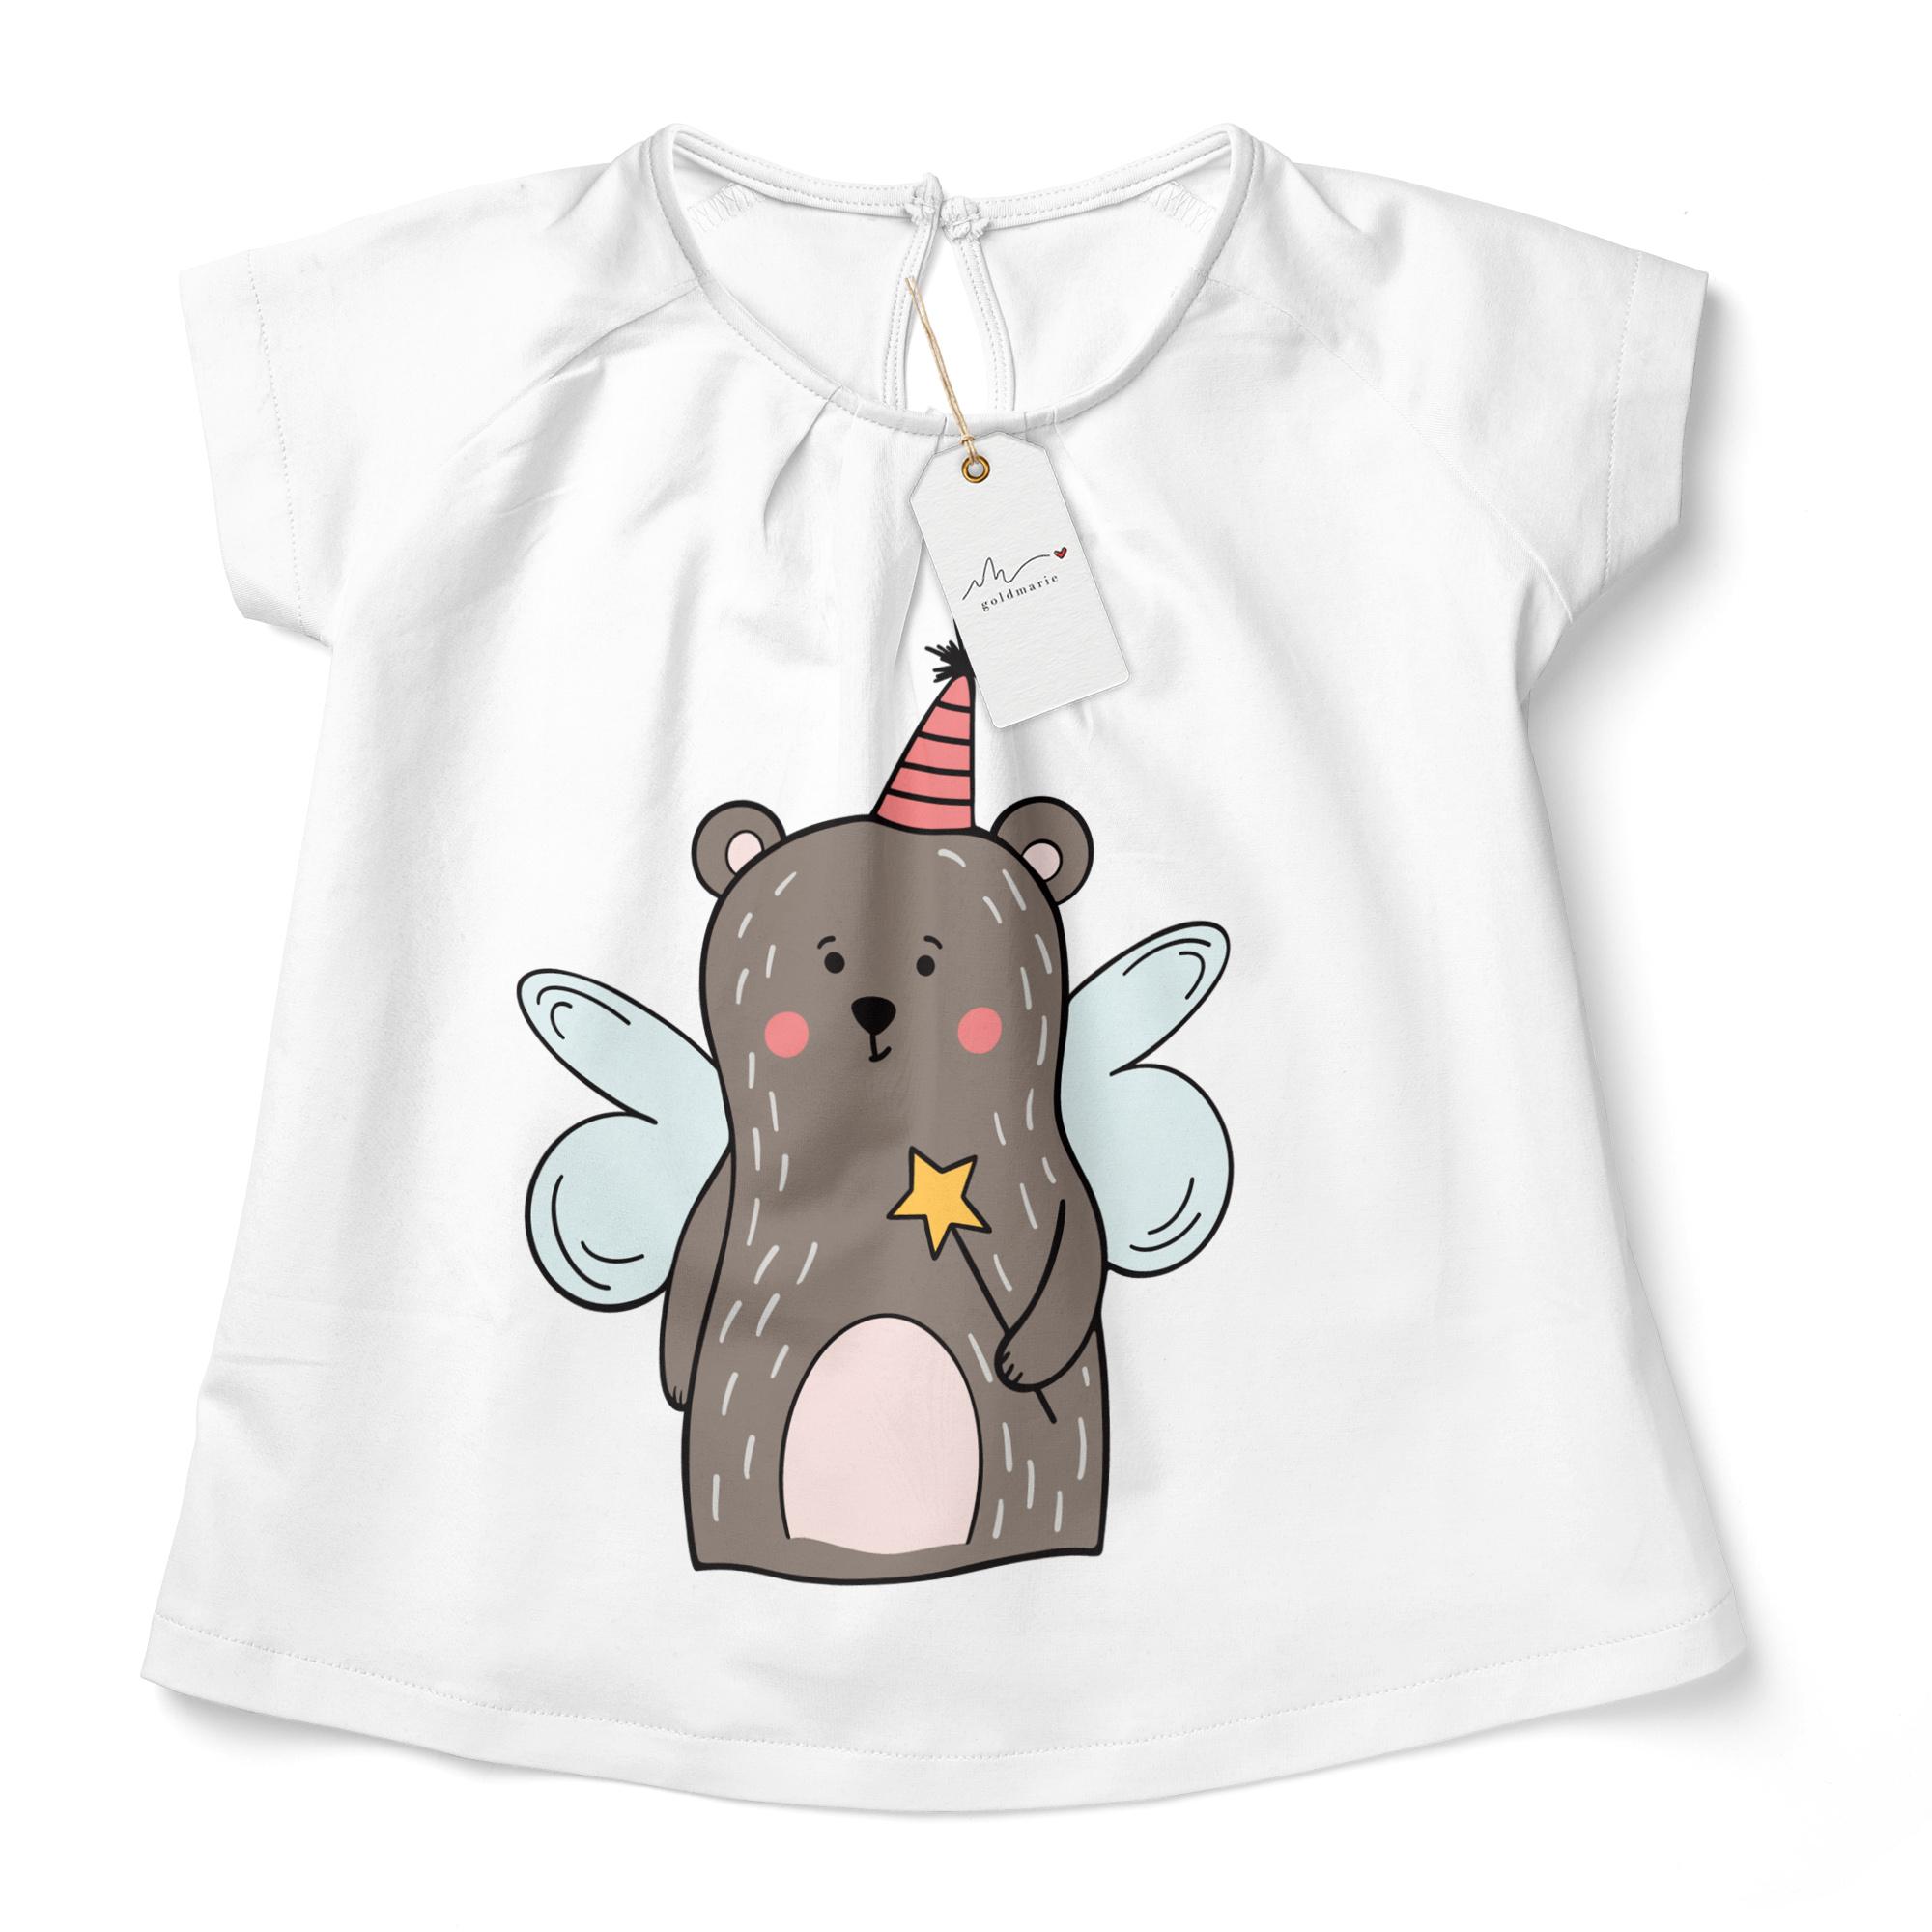 Plotterdatei Feenbär LOTTI, niedlicher Teddybär als Zauberfee verkleidet